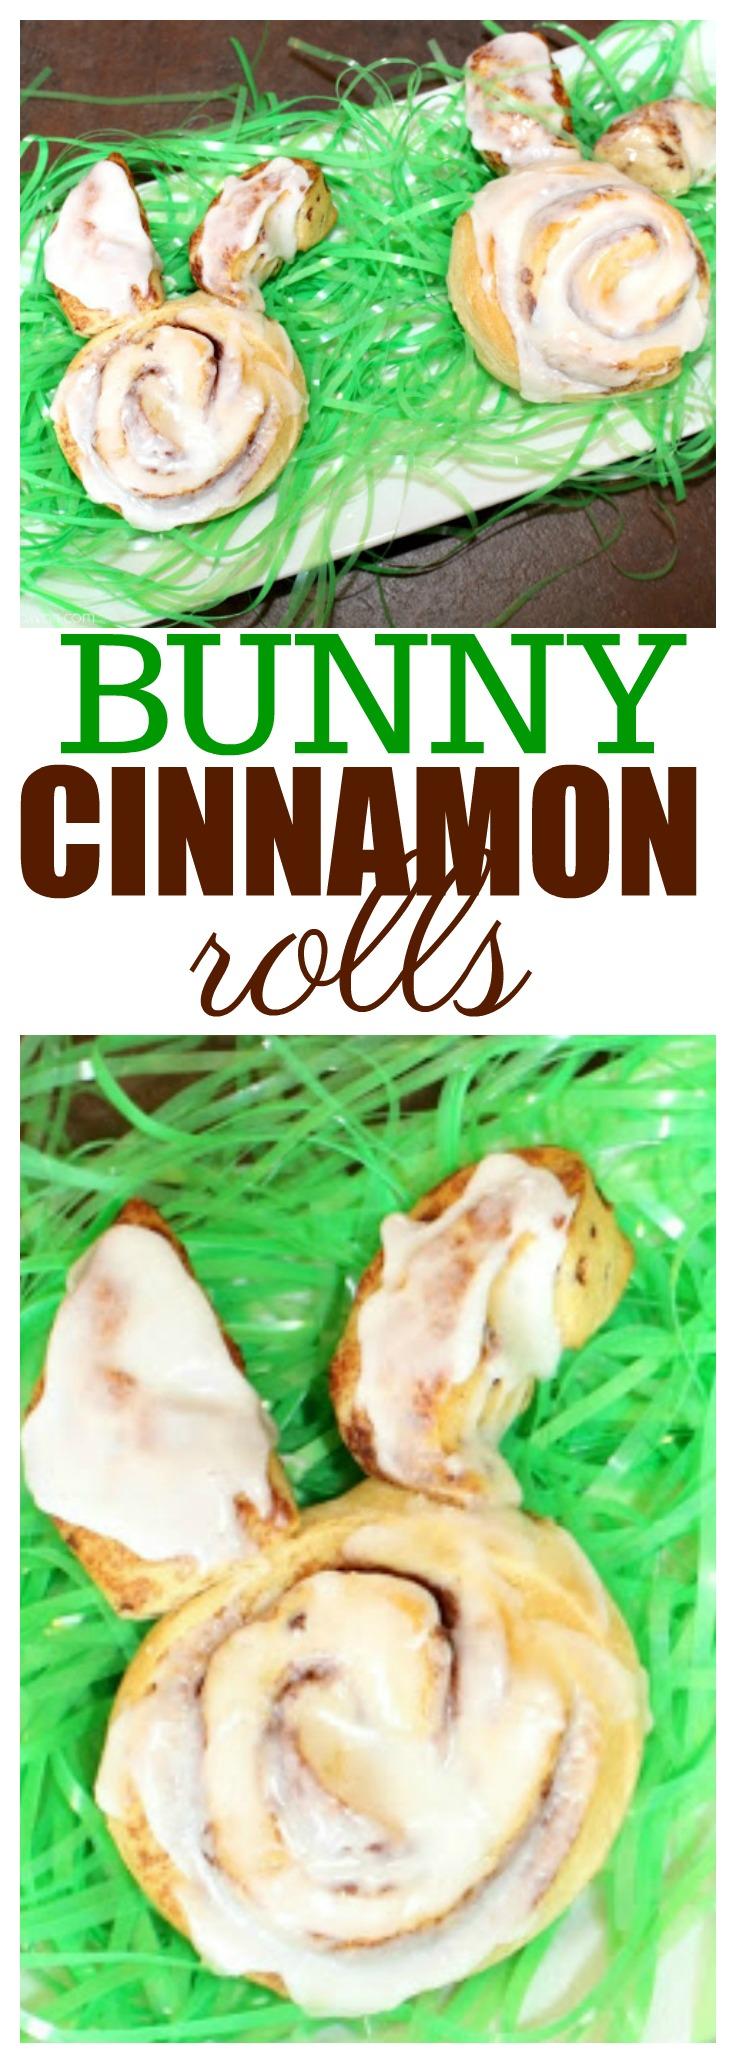 Bunny Shaped Cinnamon Rolls